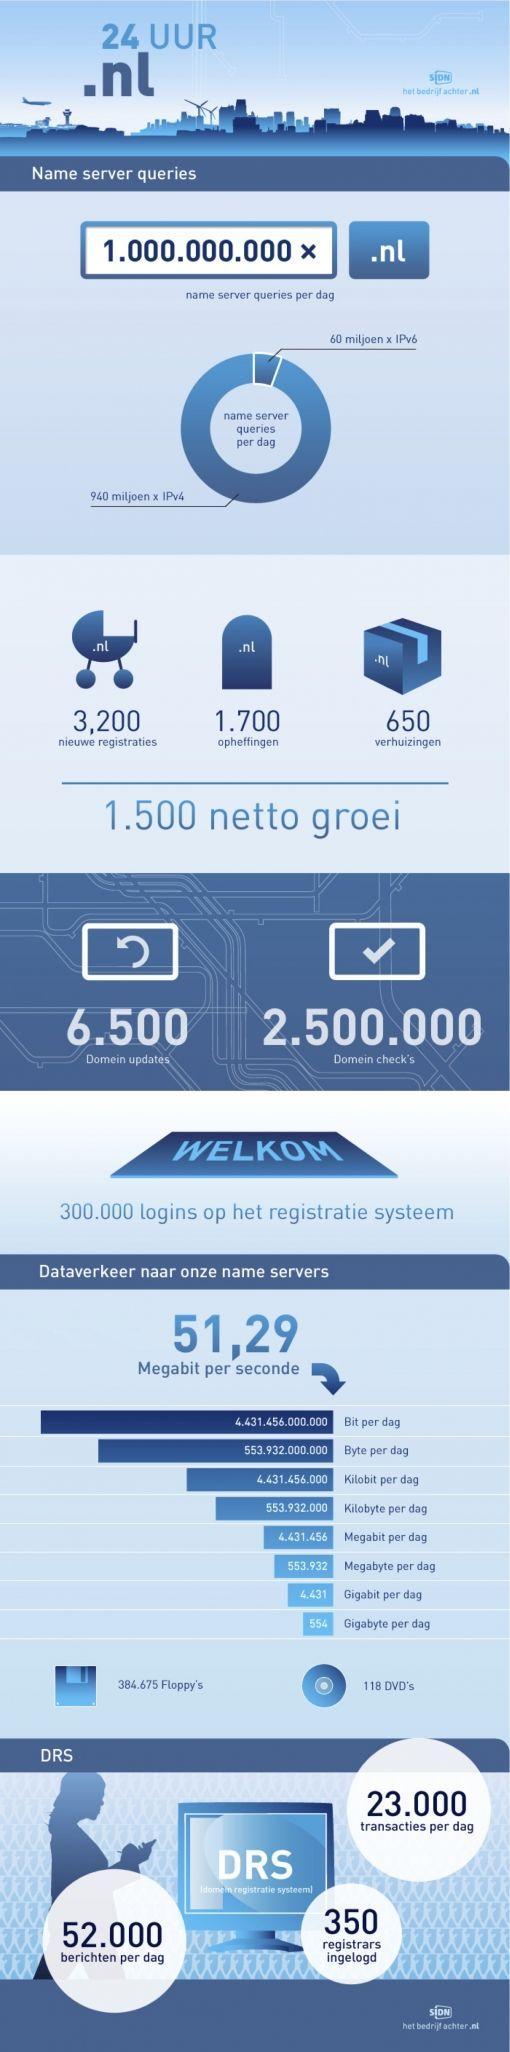 Infographic_24_uur_nl